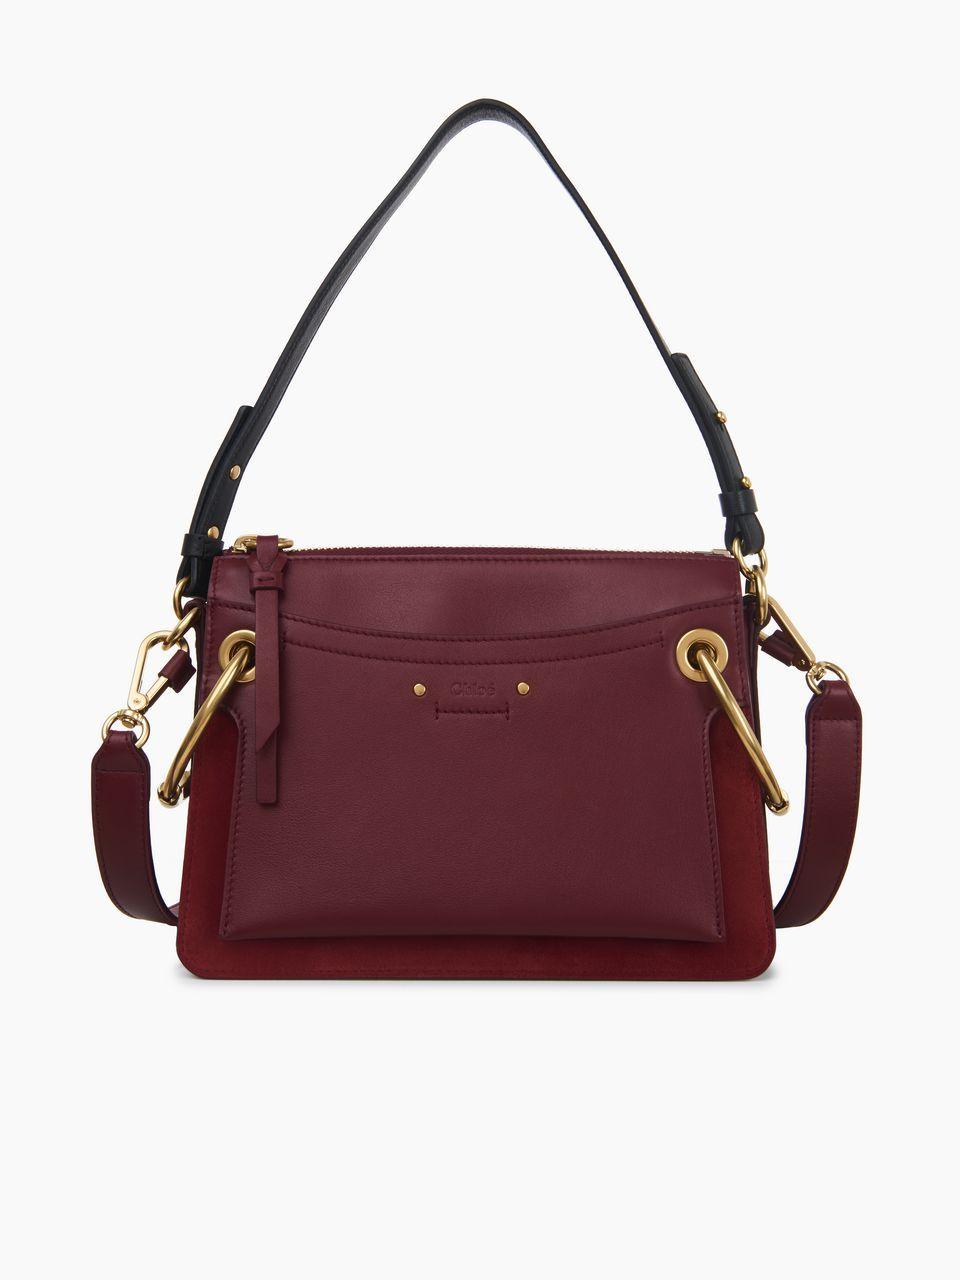 Shoulder bag   Baubles, Bags,   Do-Dads   Pinterest   Bags, Chloe ... 7fed1624fa